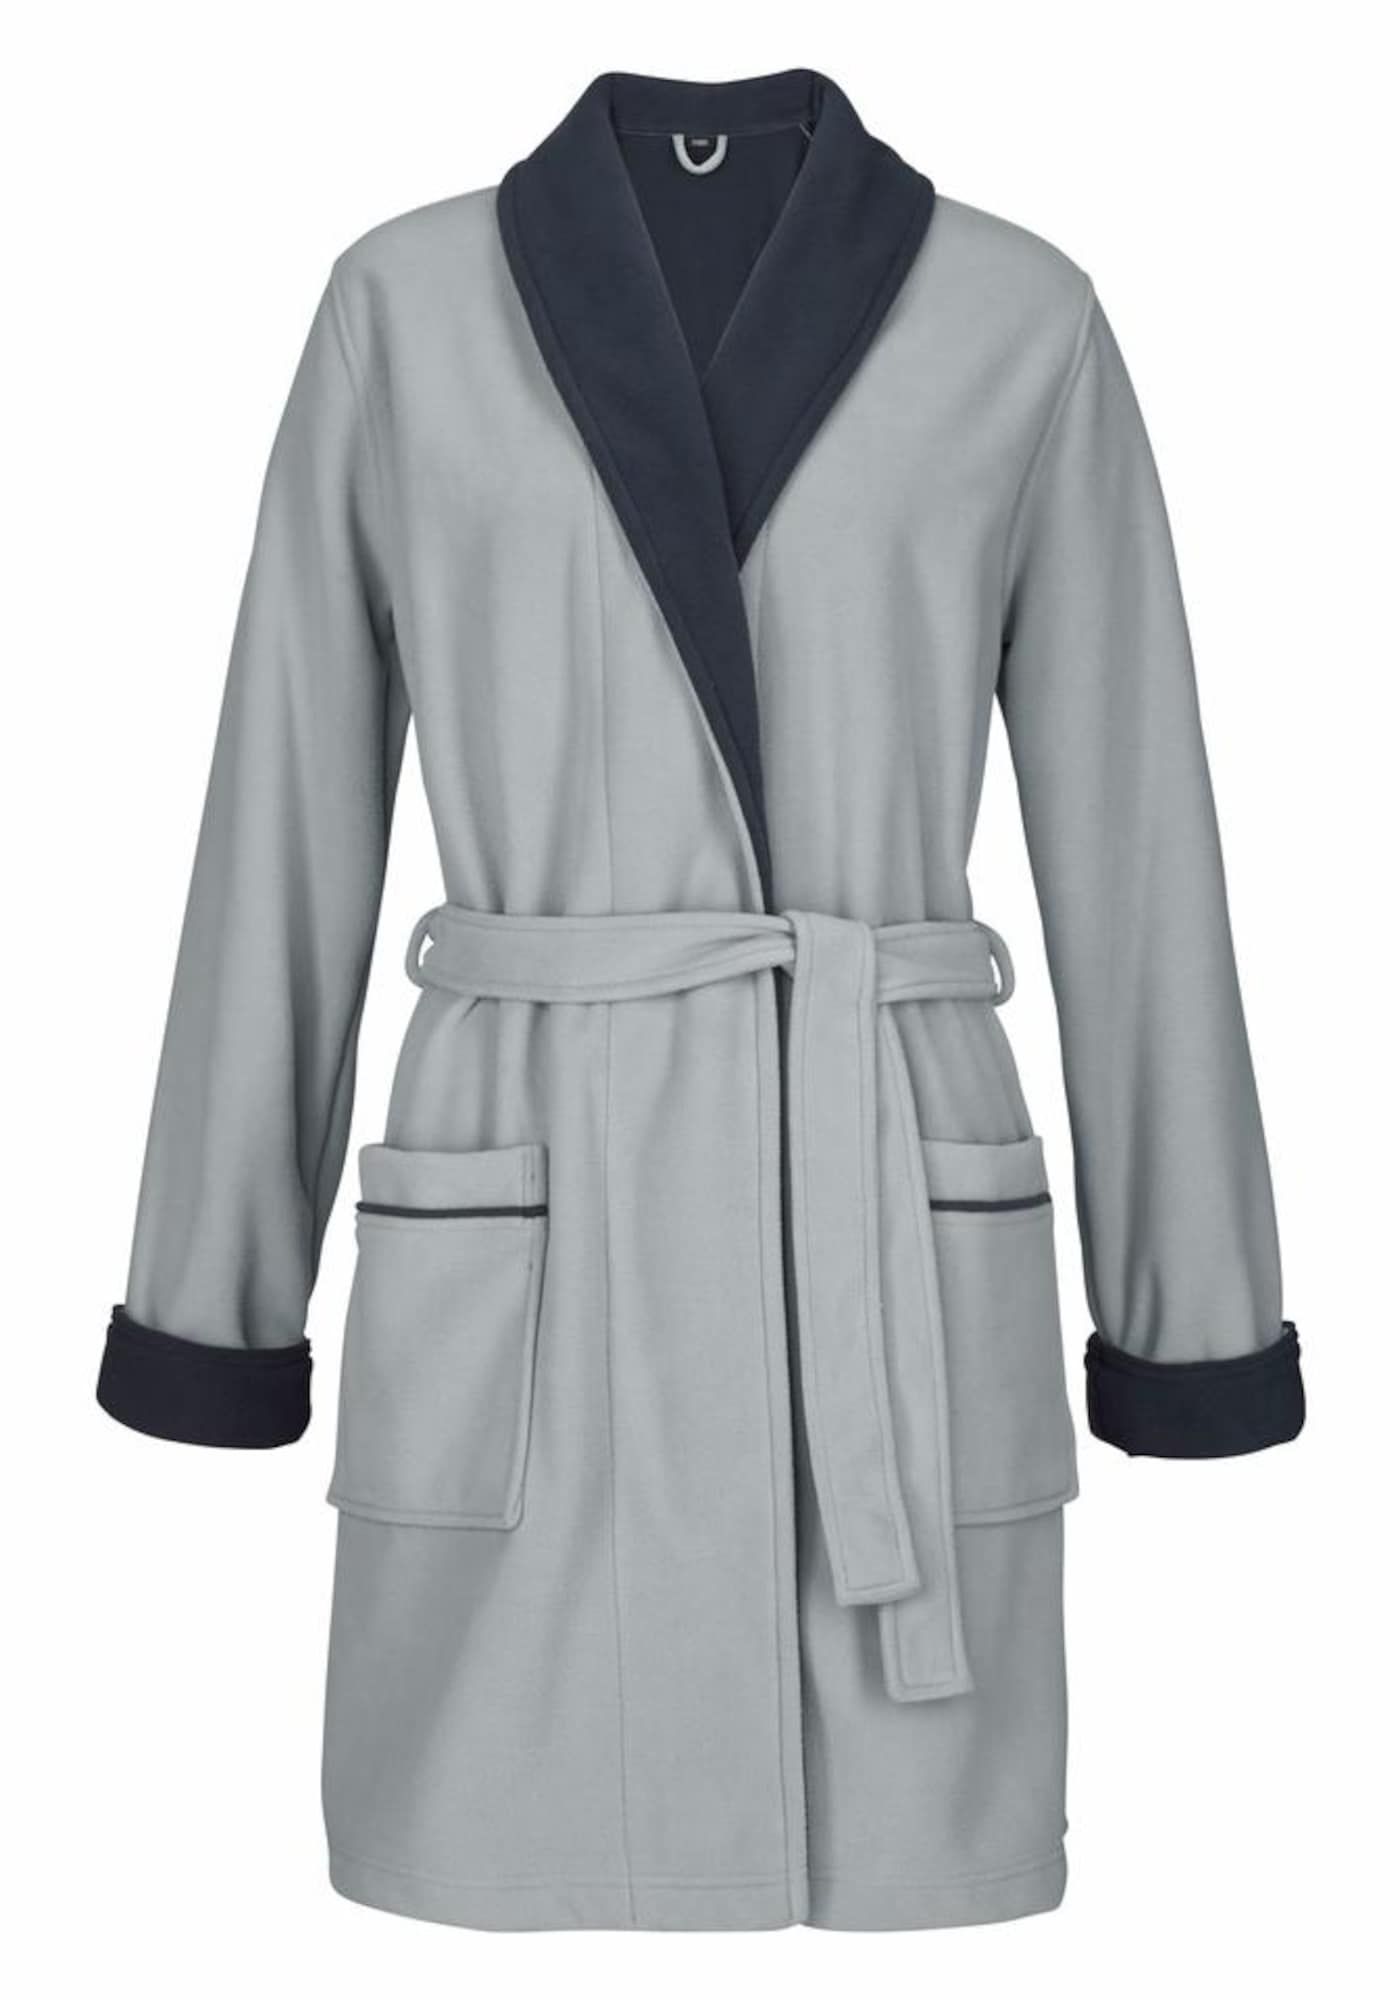 Morgenmantel   Bekleidung > Homewear > Morgenmäntel   VIVANCE